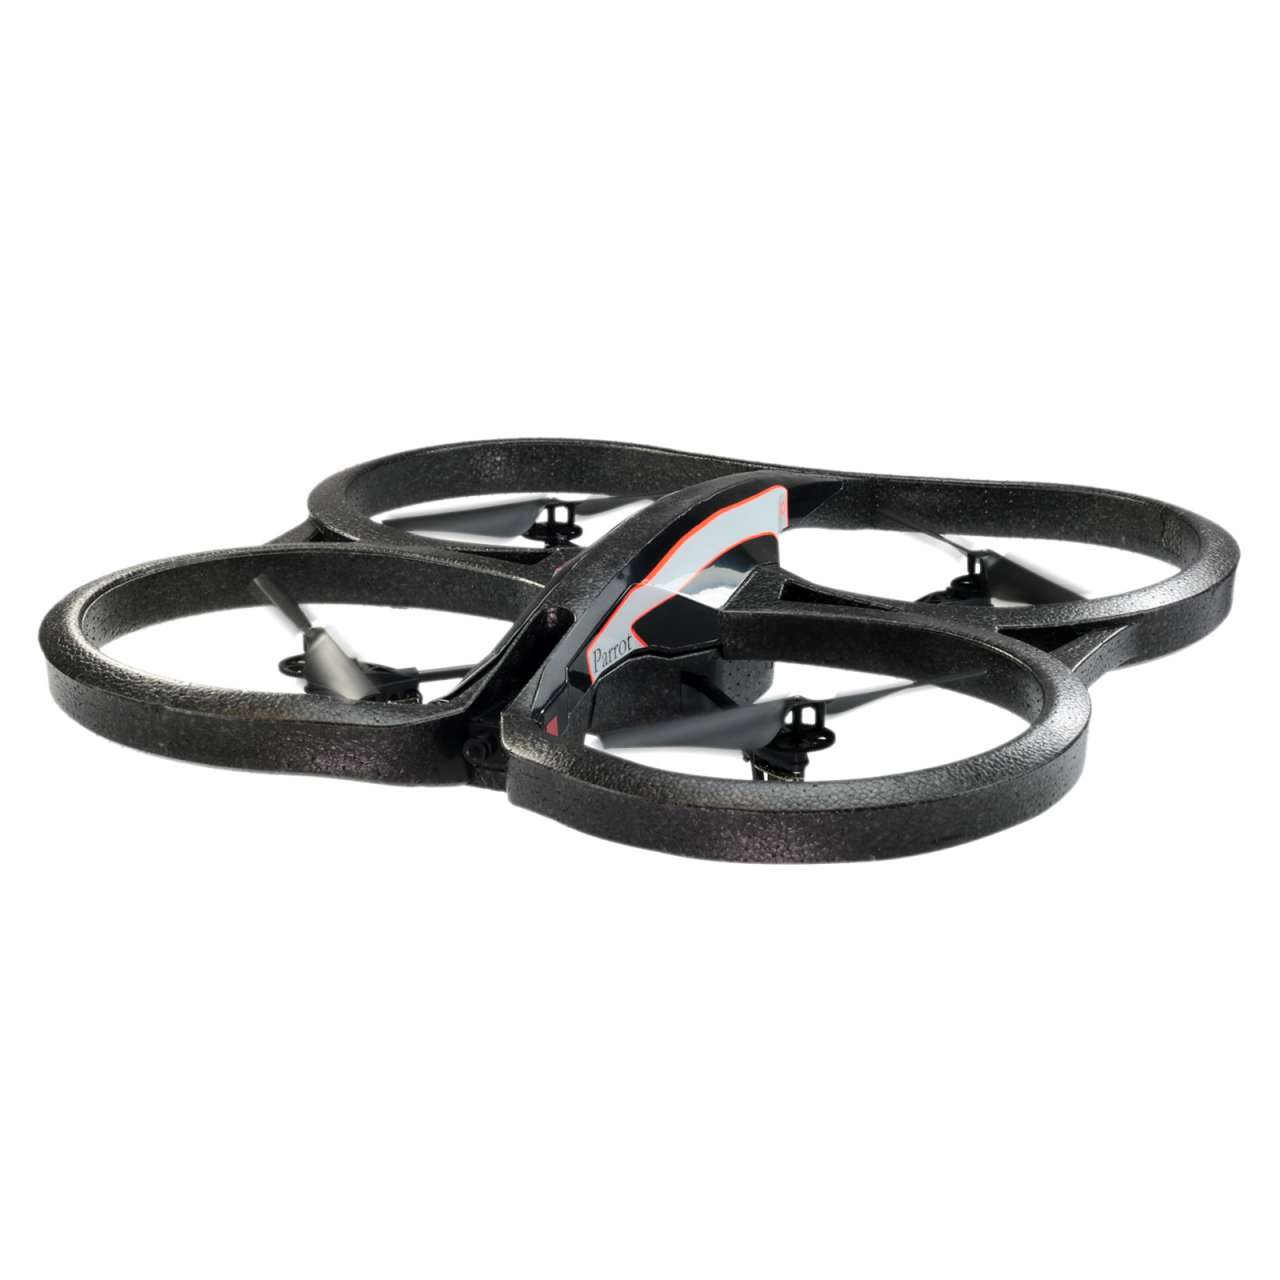 Parrot AR Drone 2.0 Elite Edition 720p HD Kamera Recertified PARDRO022